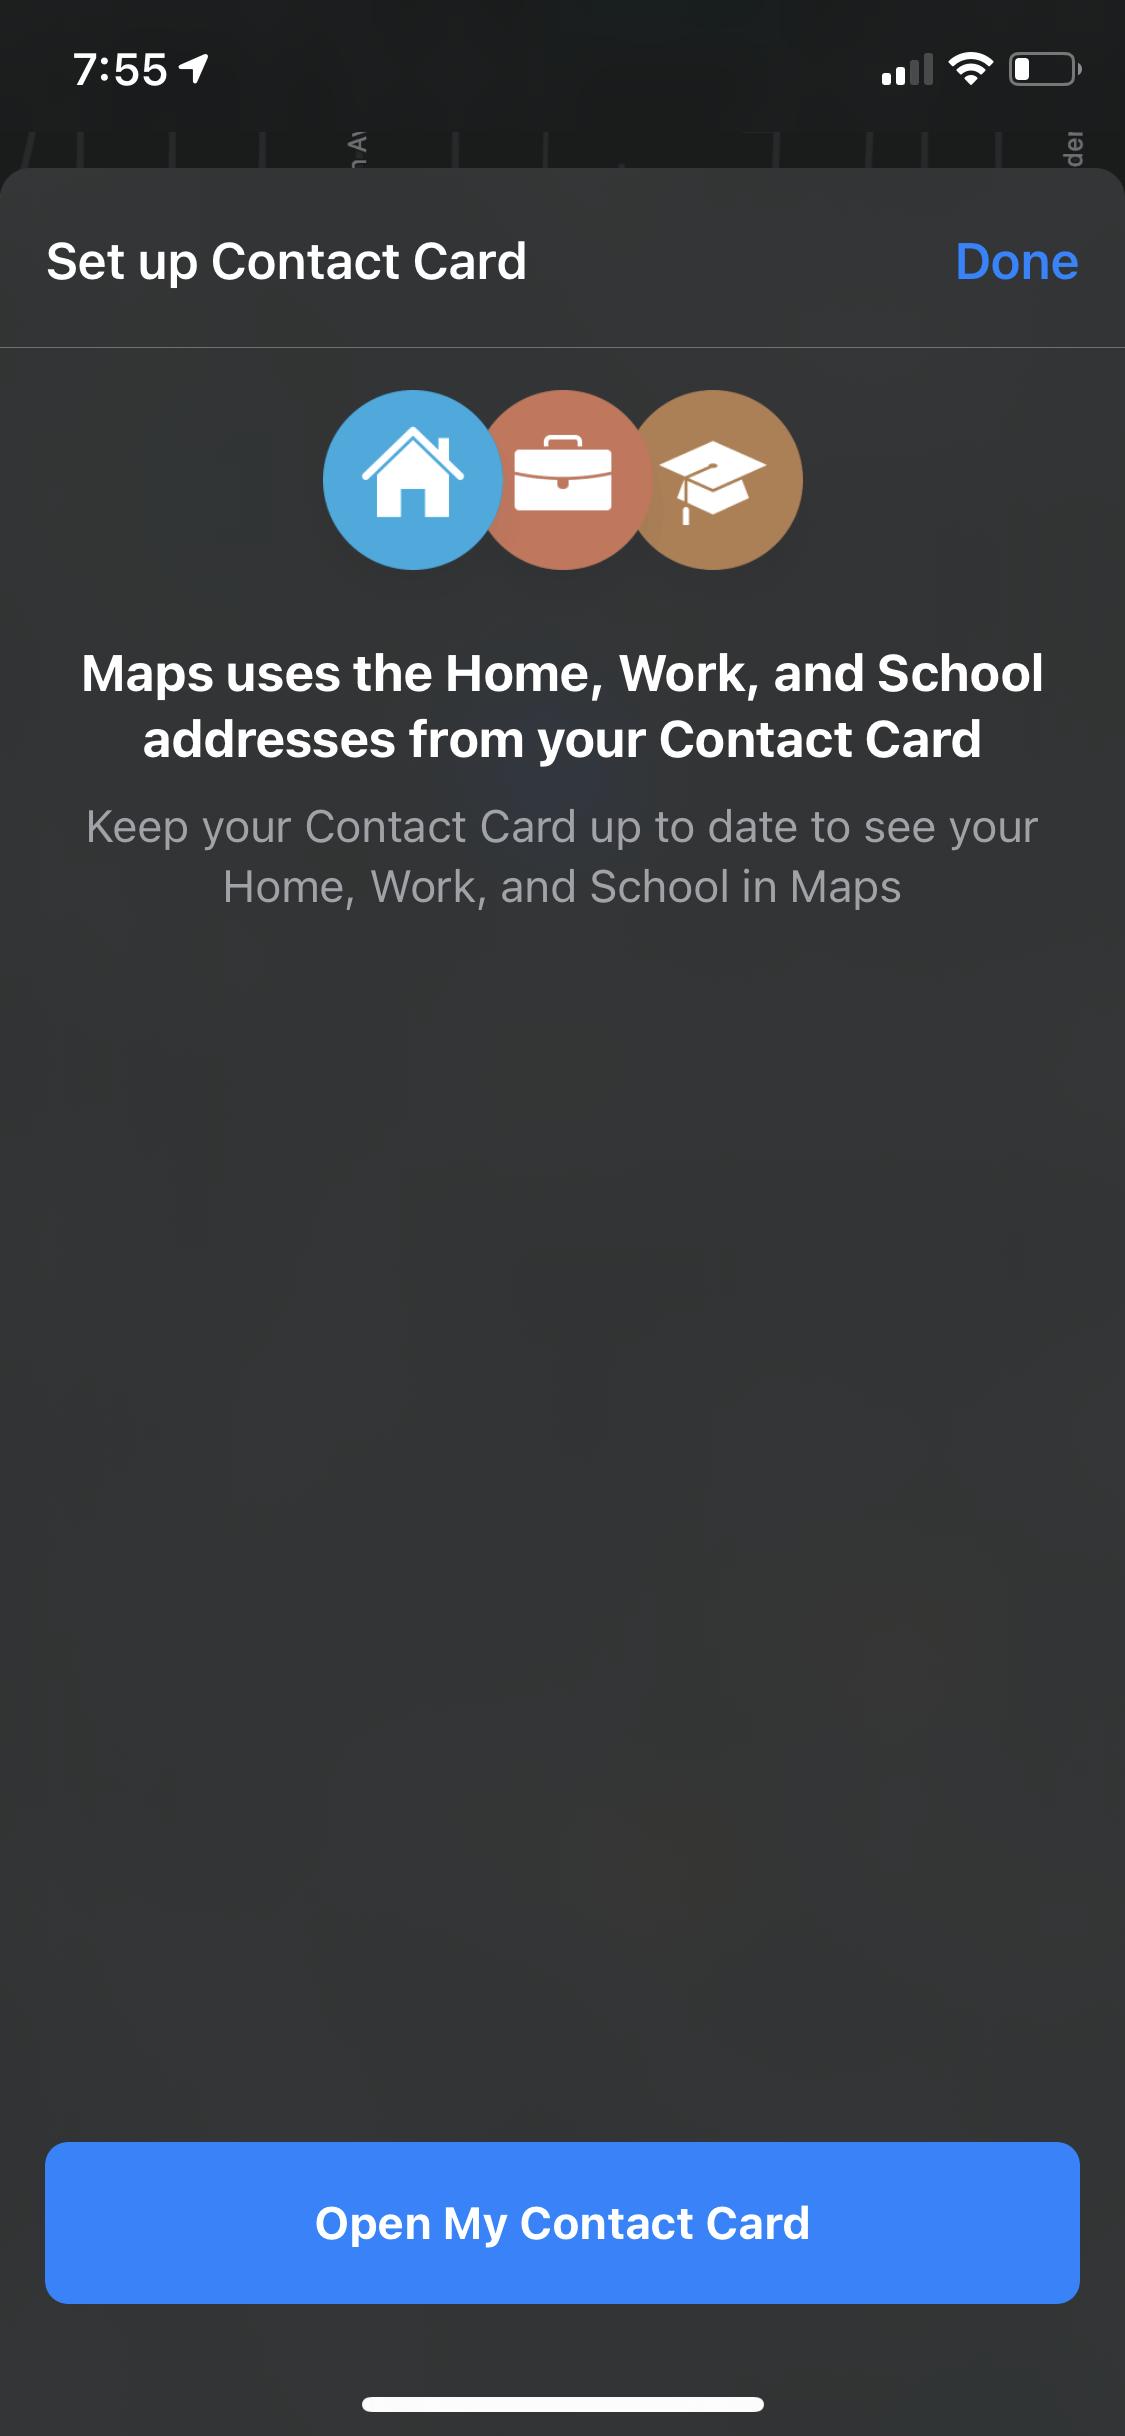 Set up your contact card